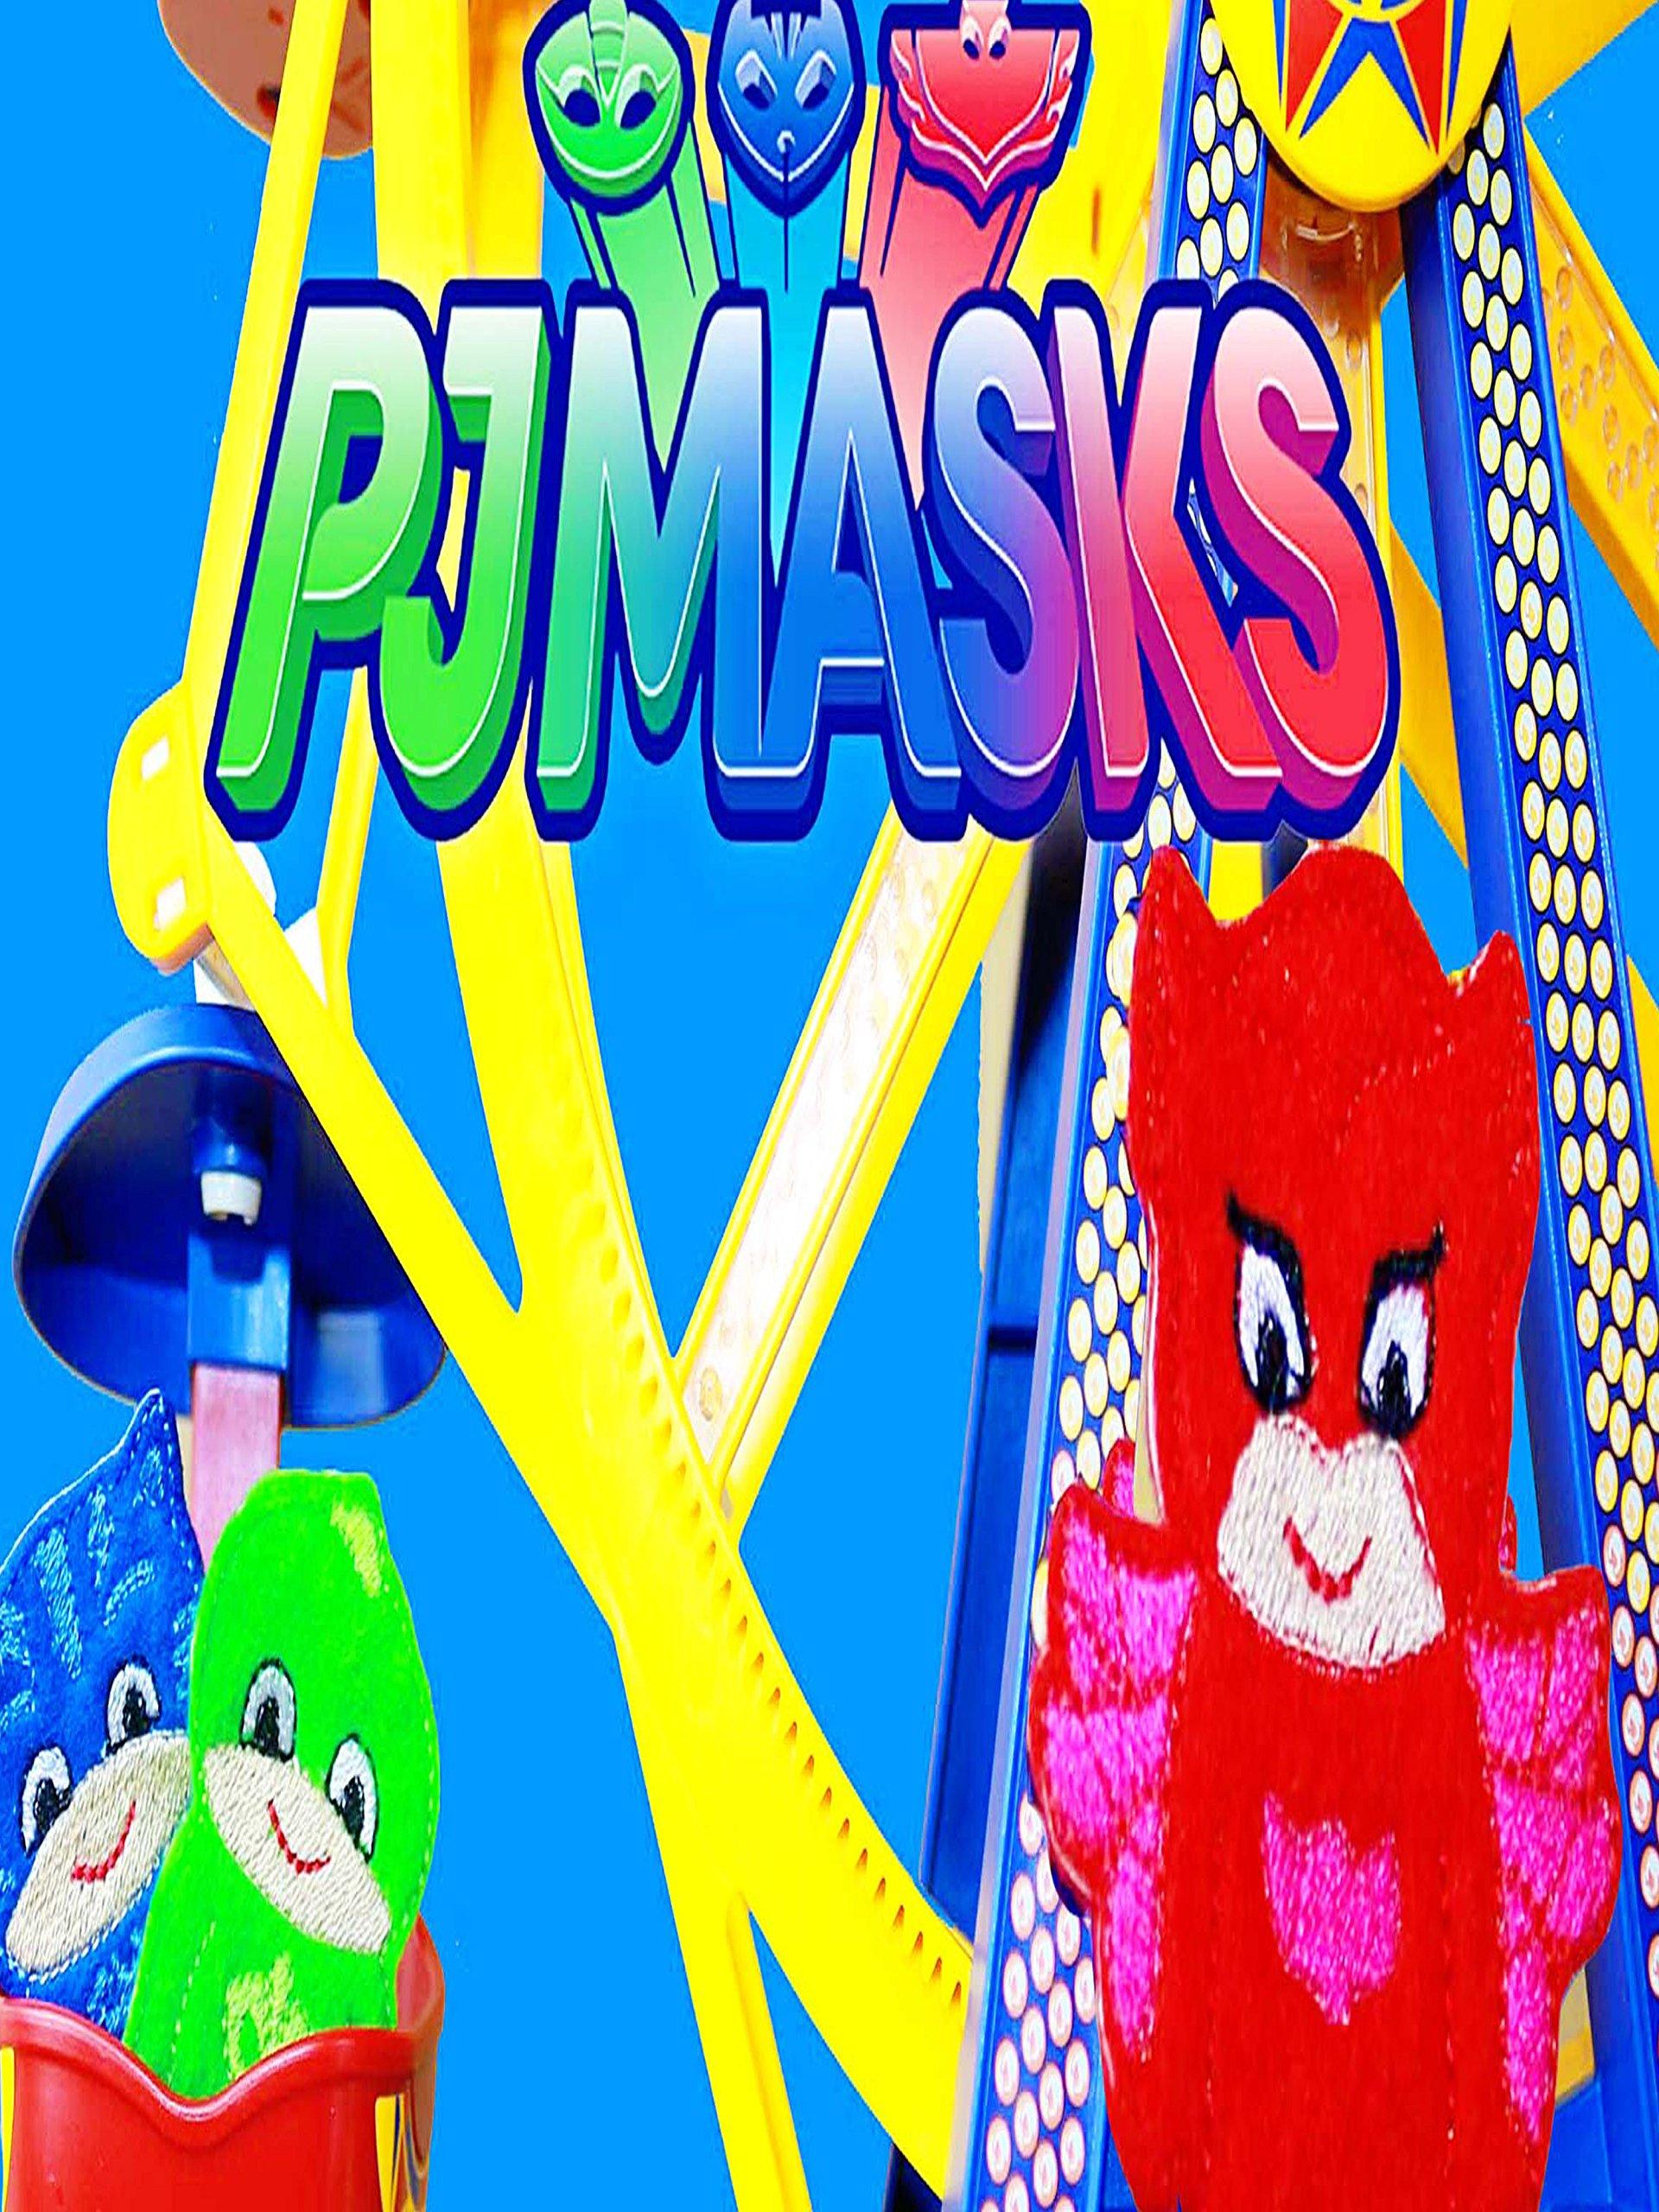 Amazon.com: PJ MASKS Disney Junior PJ MASKS Gekko Catboy Owlette GO TO CARNIVAL RIDES Toys Parody: Catboy, Owlette, Gekko, Valerie